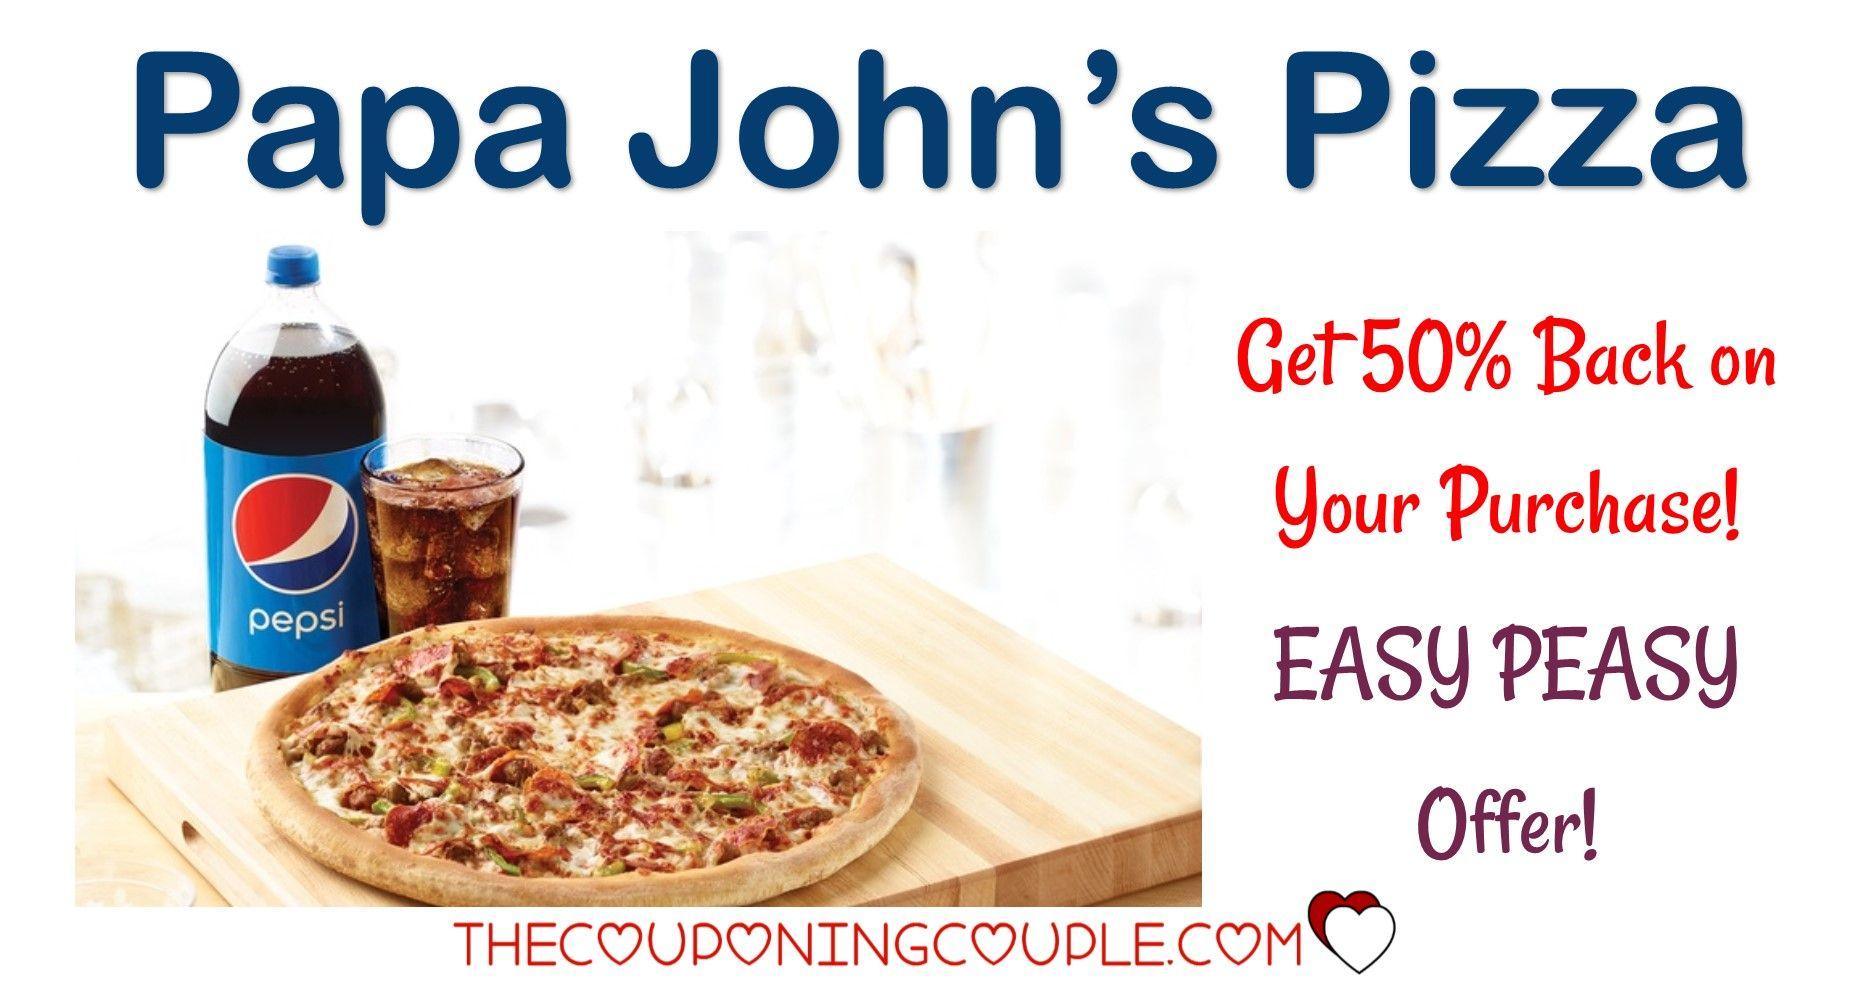 Papa Johns Pizza - Get 50% BACK on Purchase! | Coupon matchups ...